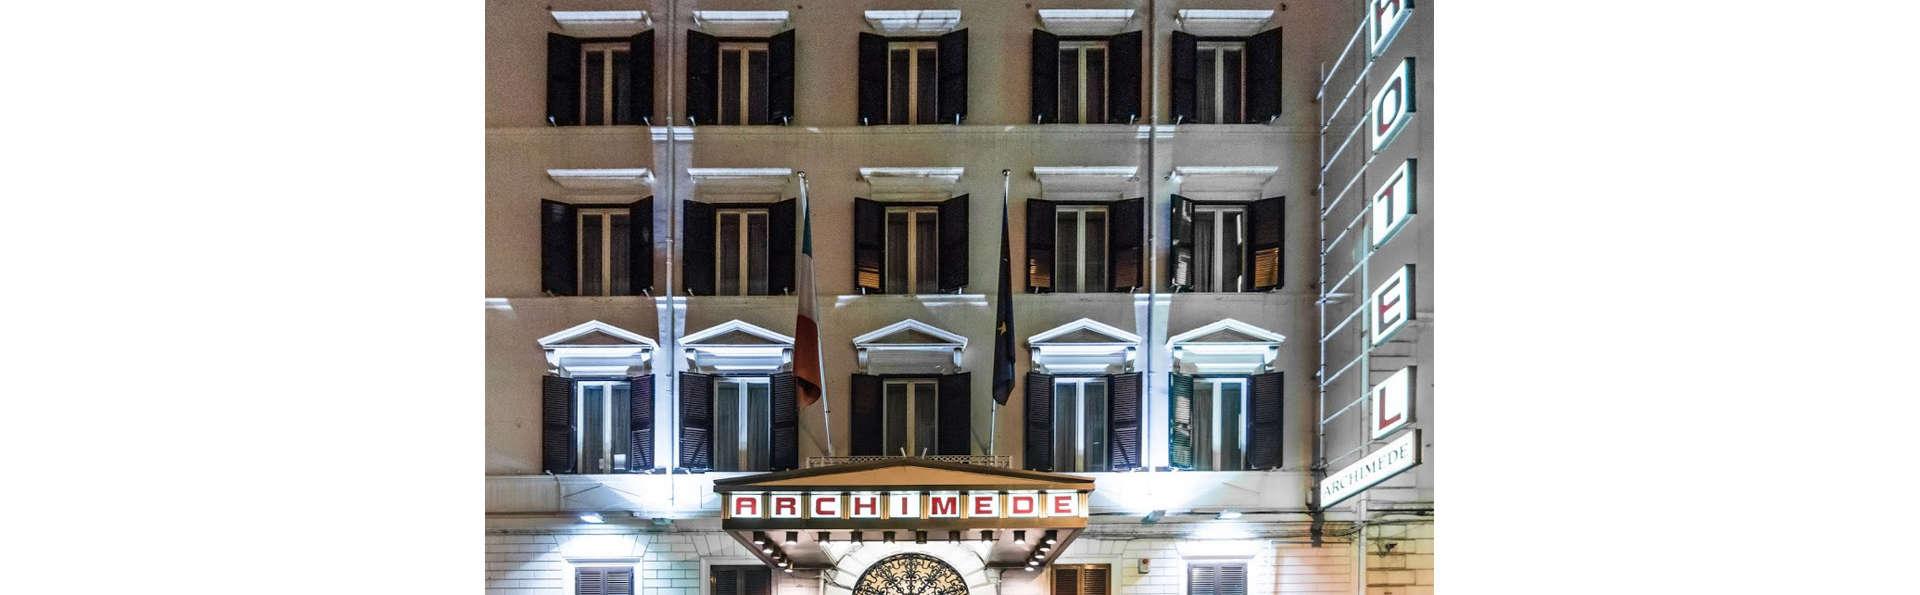 Raeli Hotel Archimede - EDIT_FRONT_01.jpg